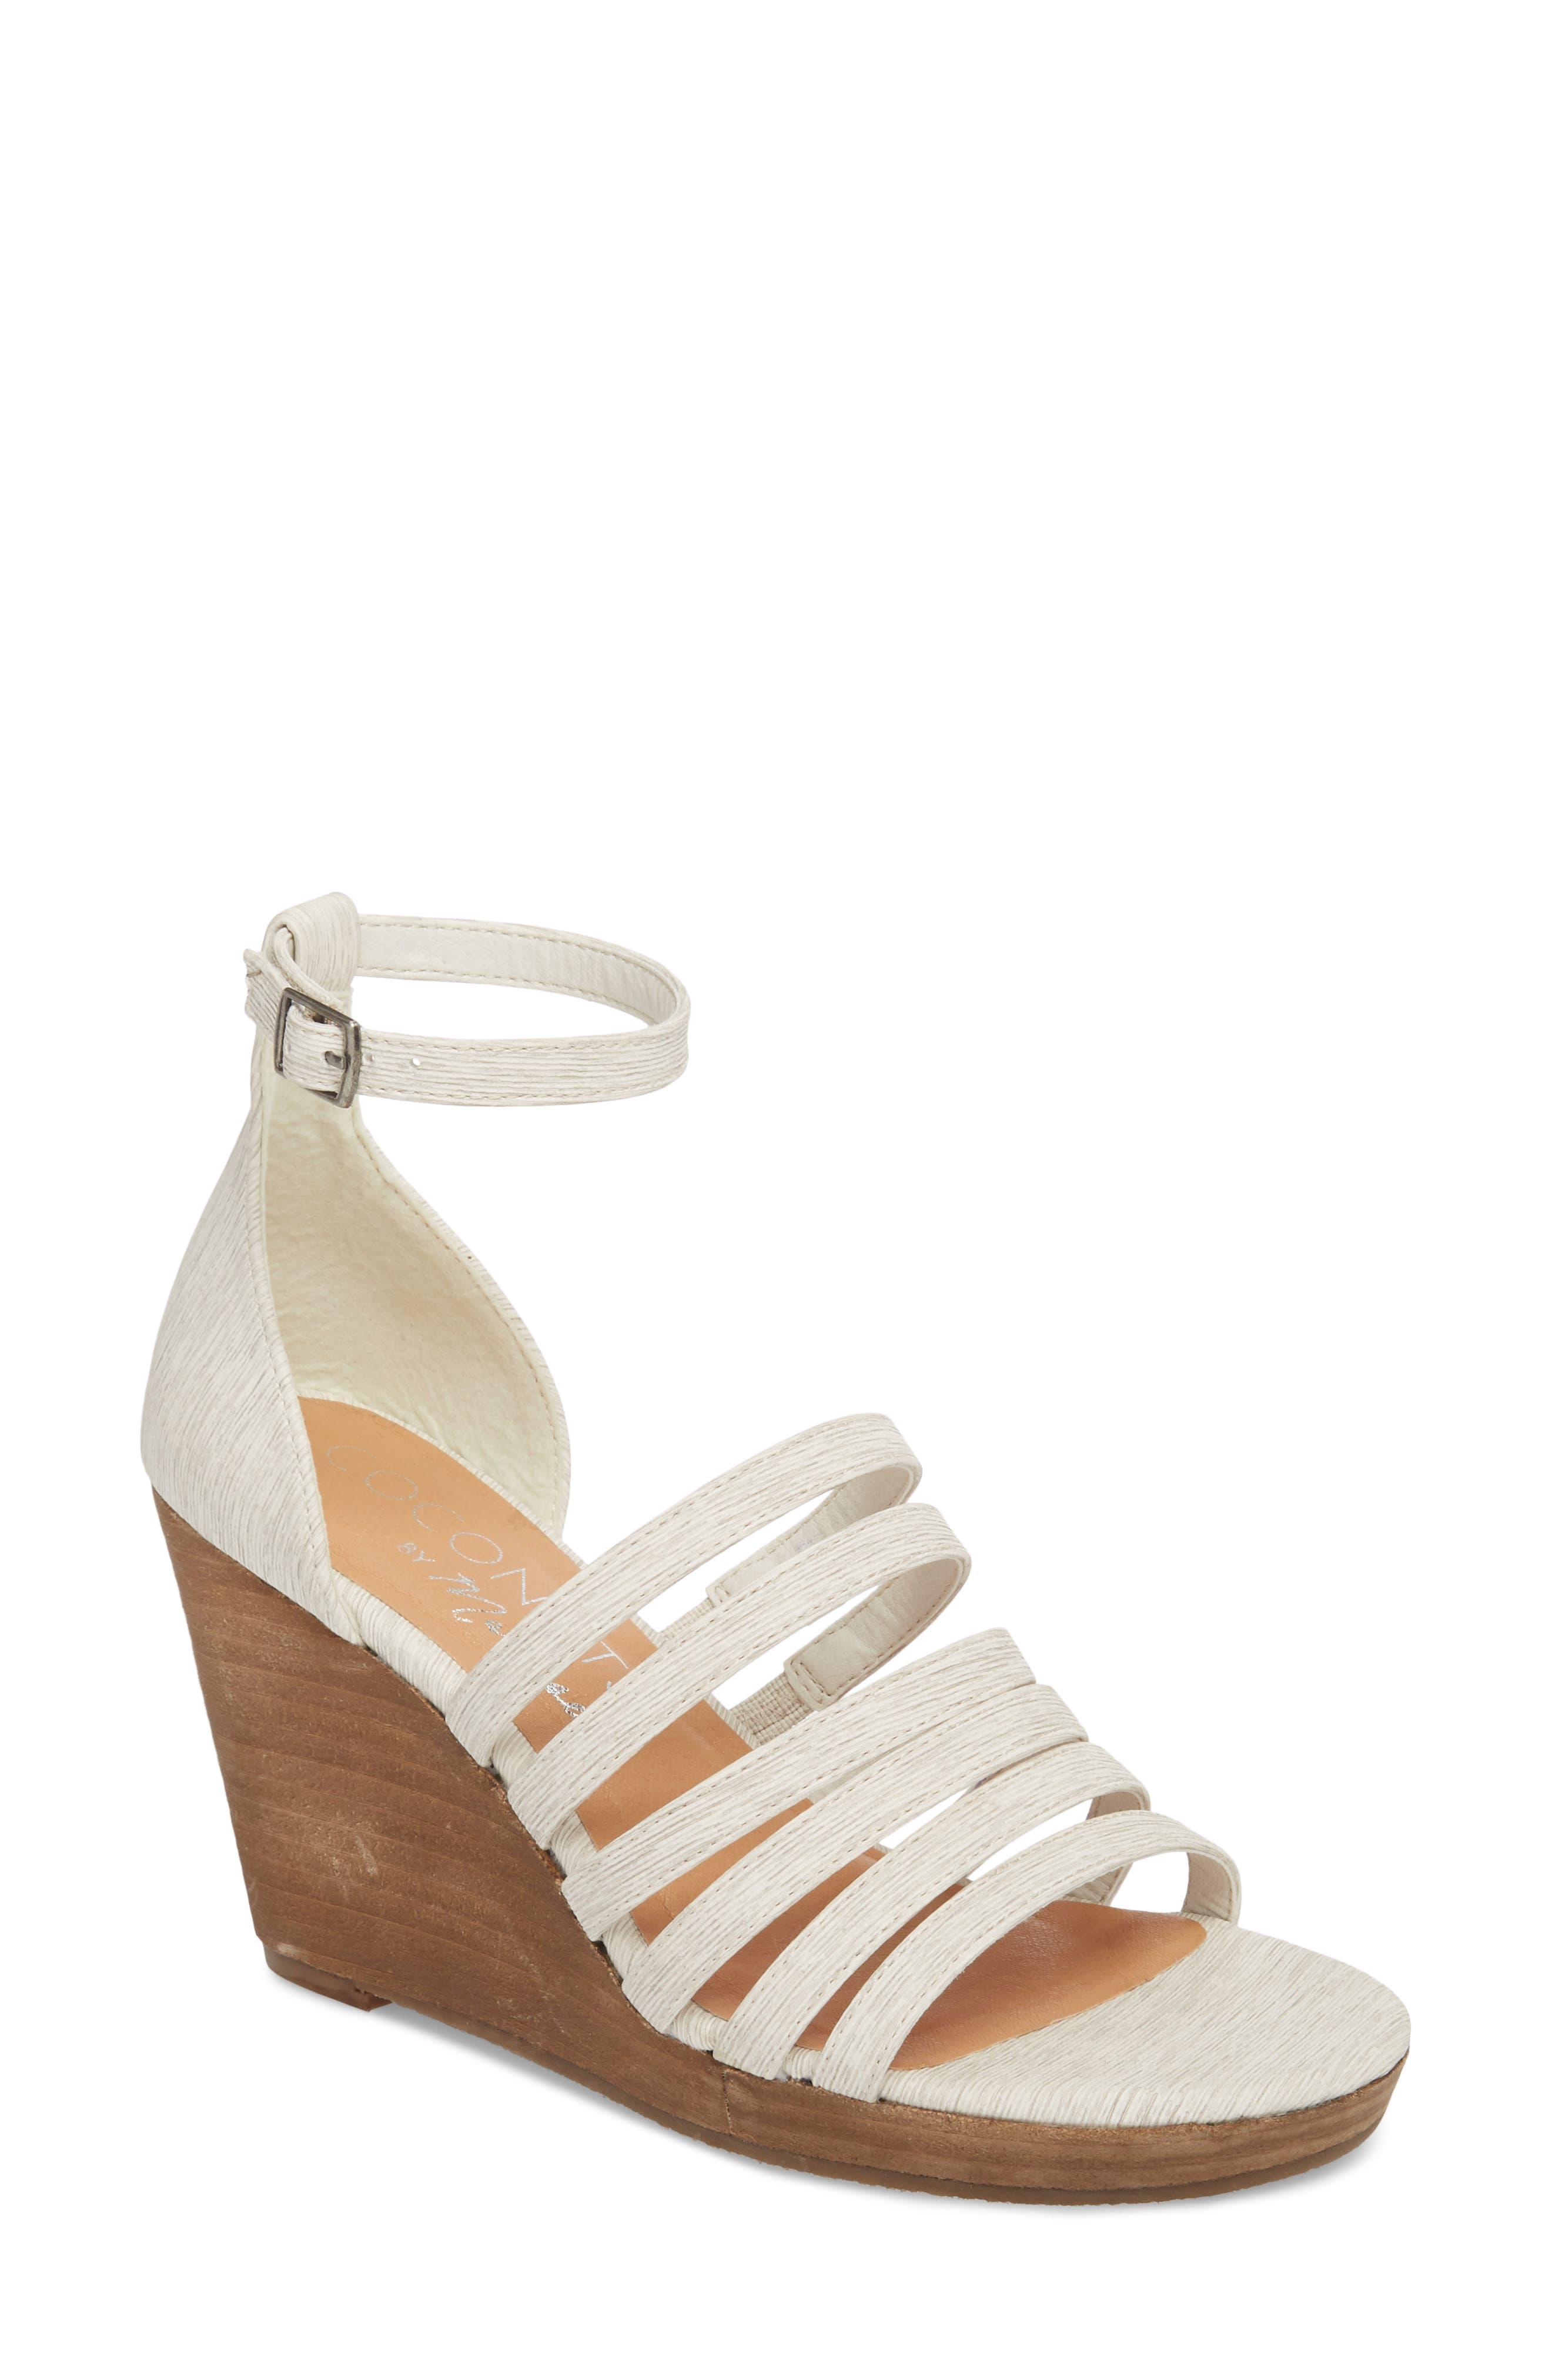 Kiera Wedge Sandal,                         Main,                         color, NATURAL FABRIC